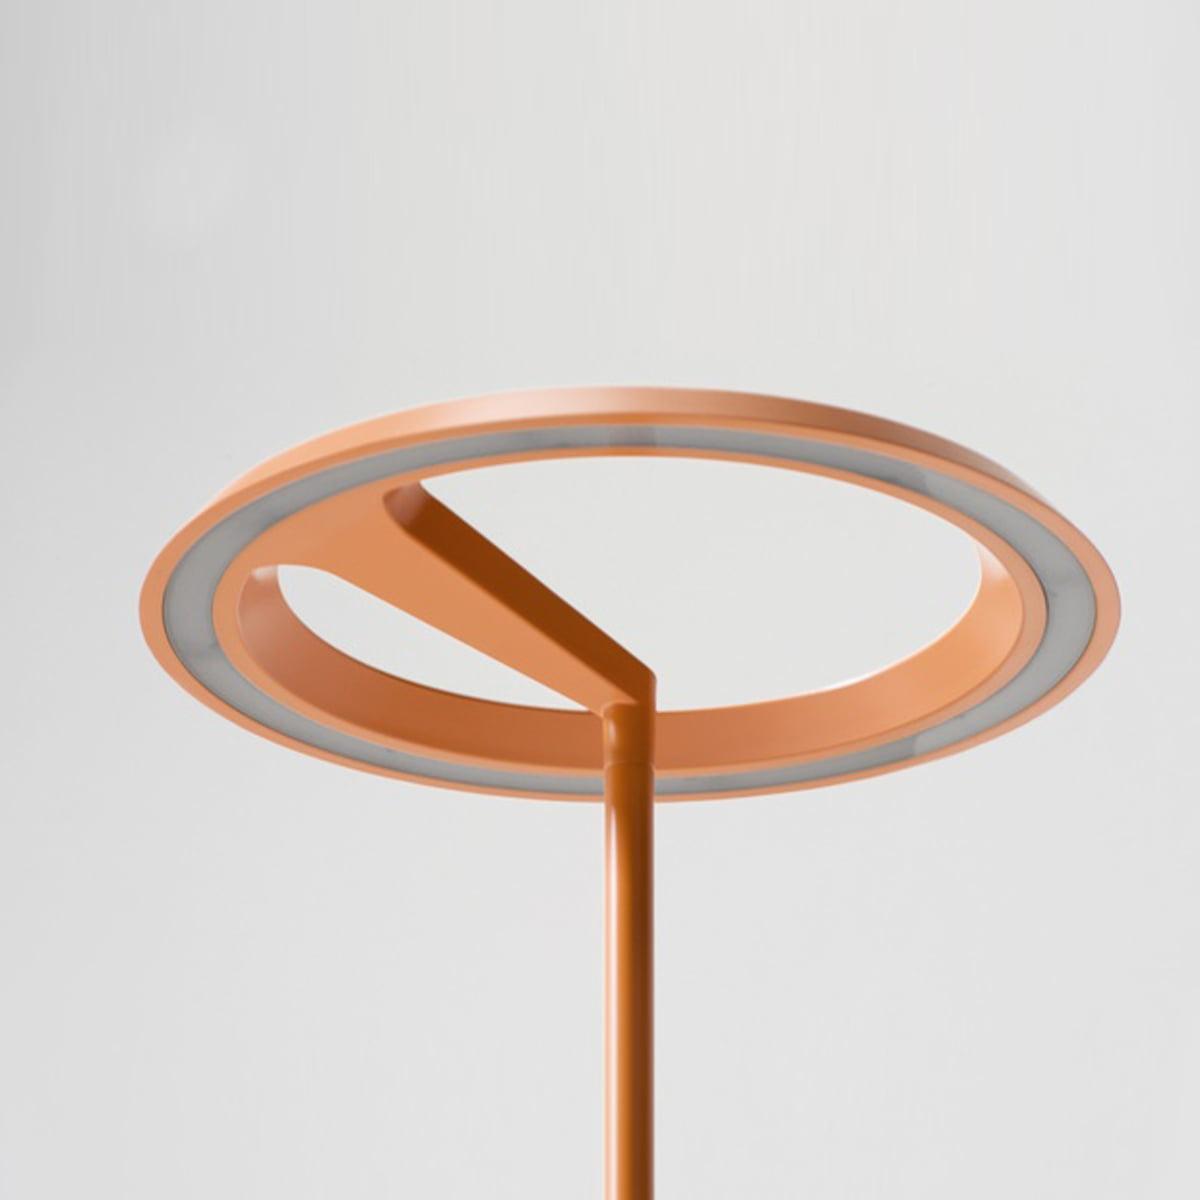 claesson koivisto rune floor lamp w126f. Black Bedroom Furniture Sets. Home Design Ideas